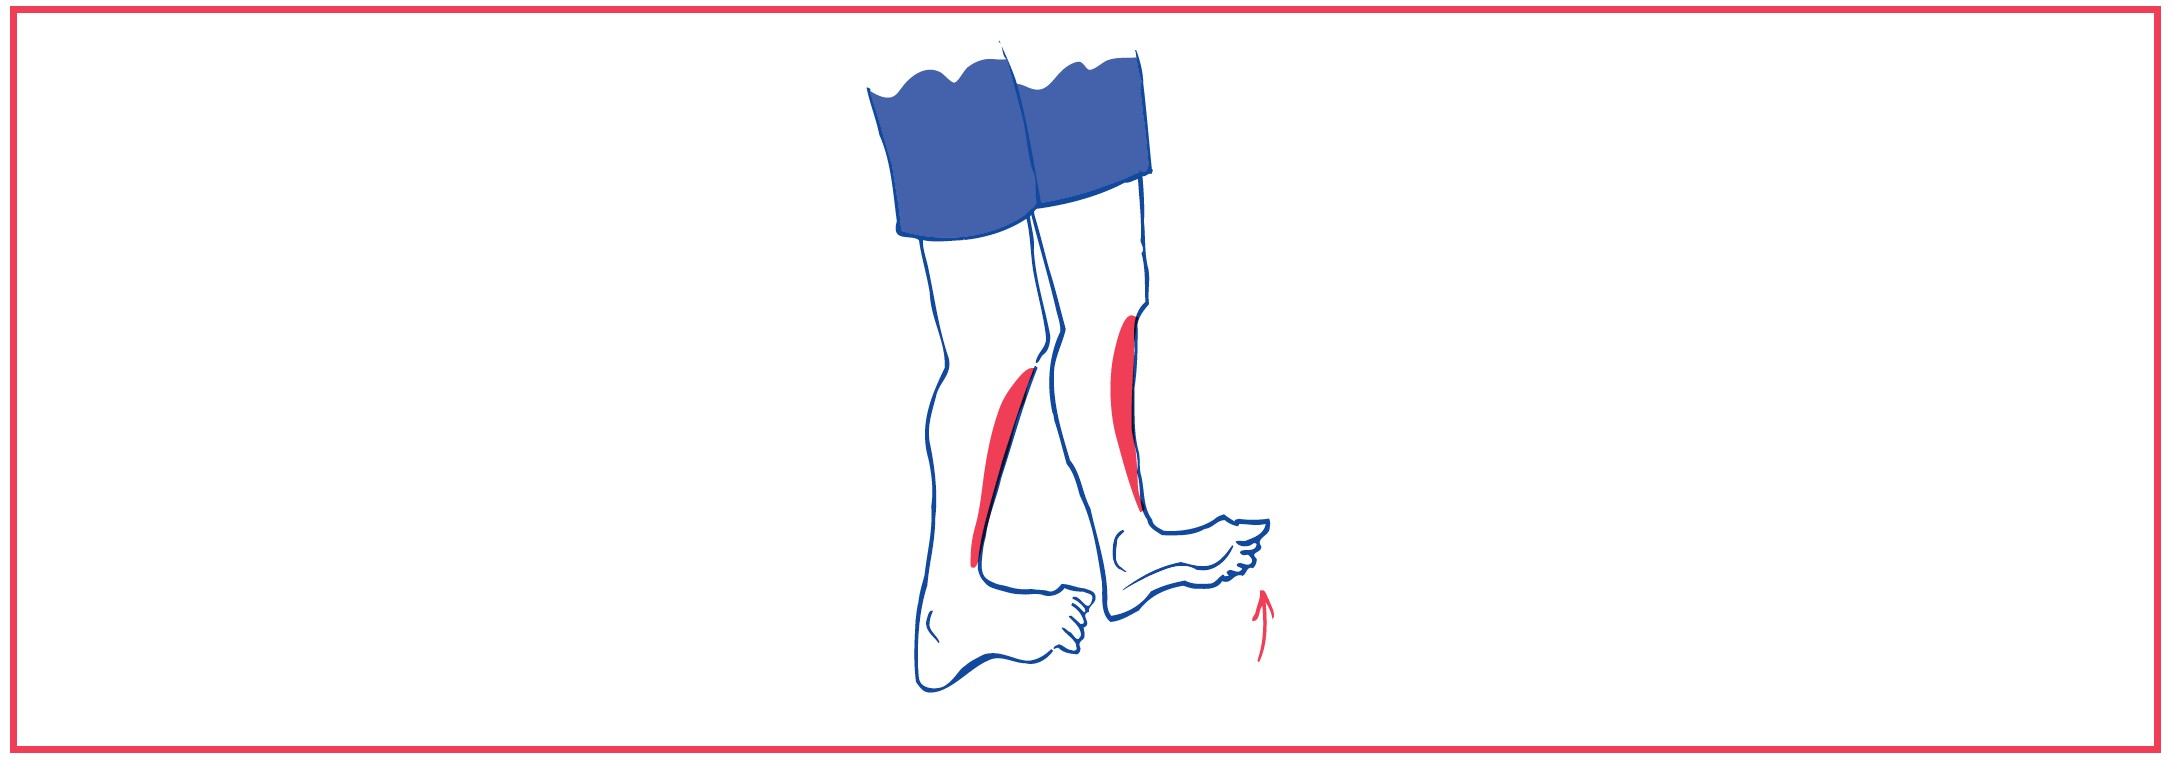 2. Walking on toes or heels balancing exercise